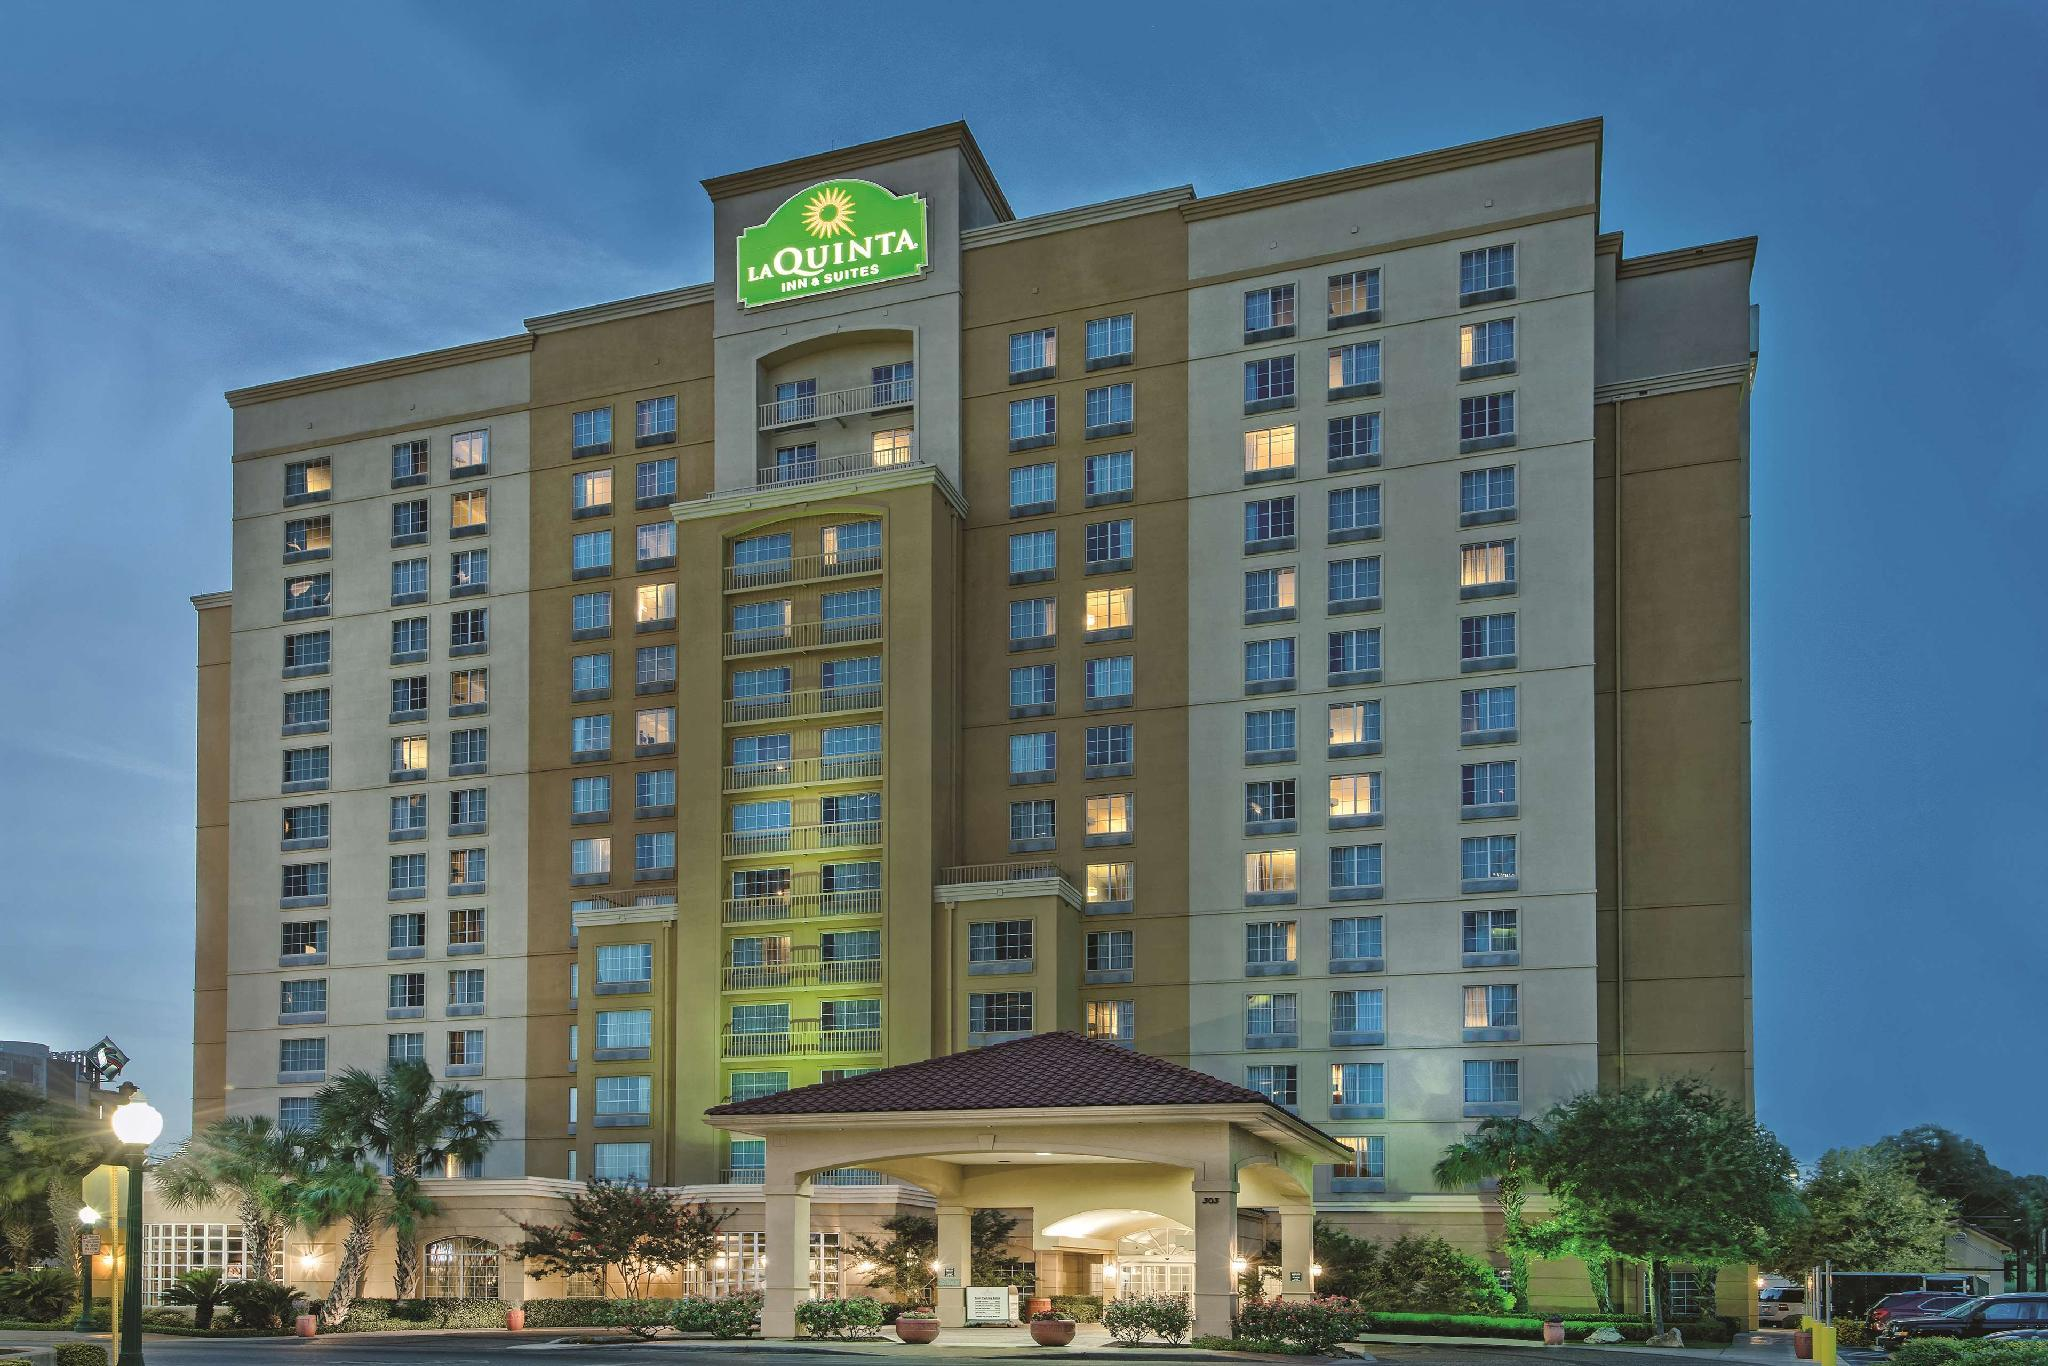 La Quinta Inn And Suites By Wyndham San Antonio Riverwalk